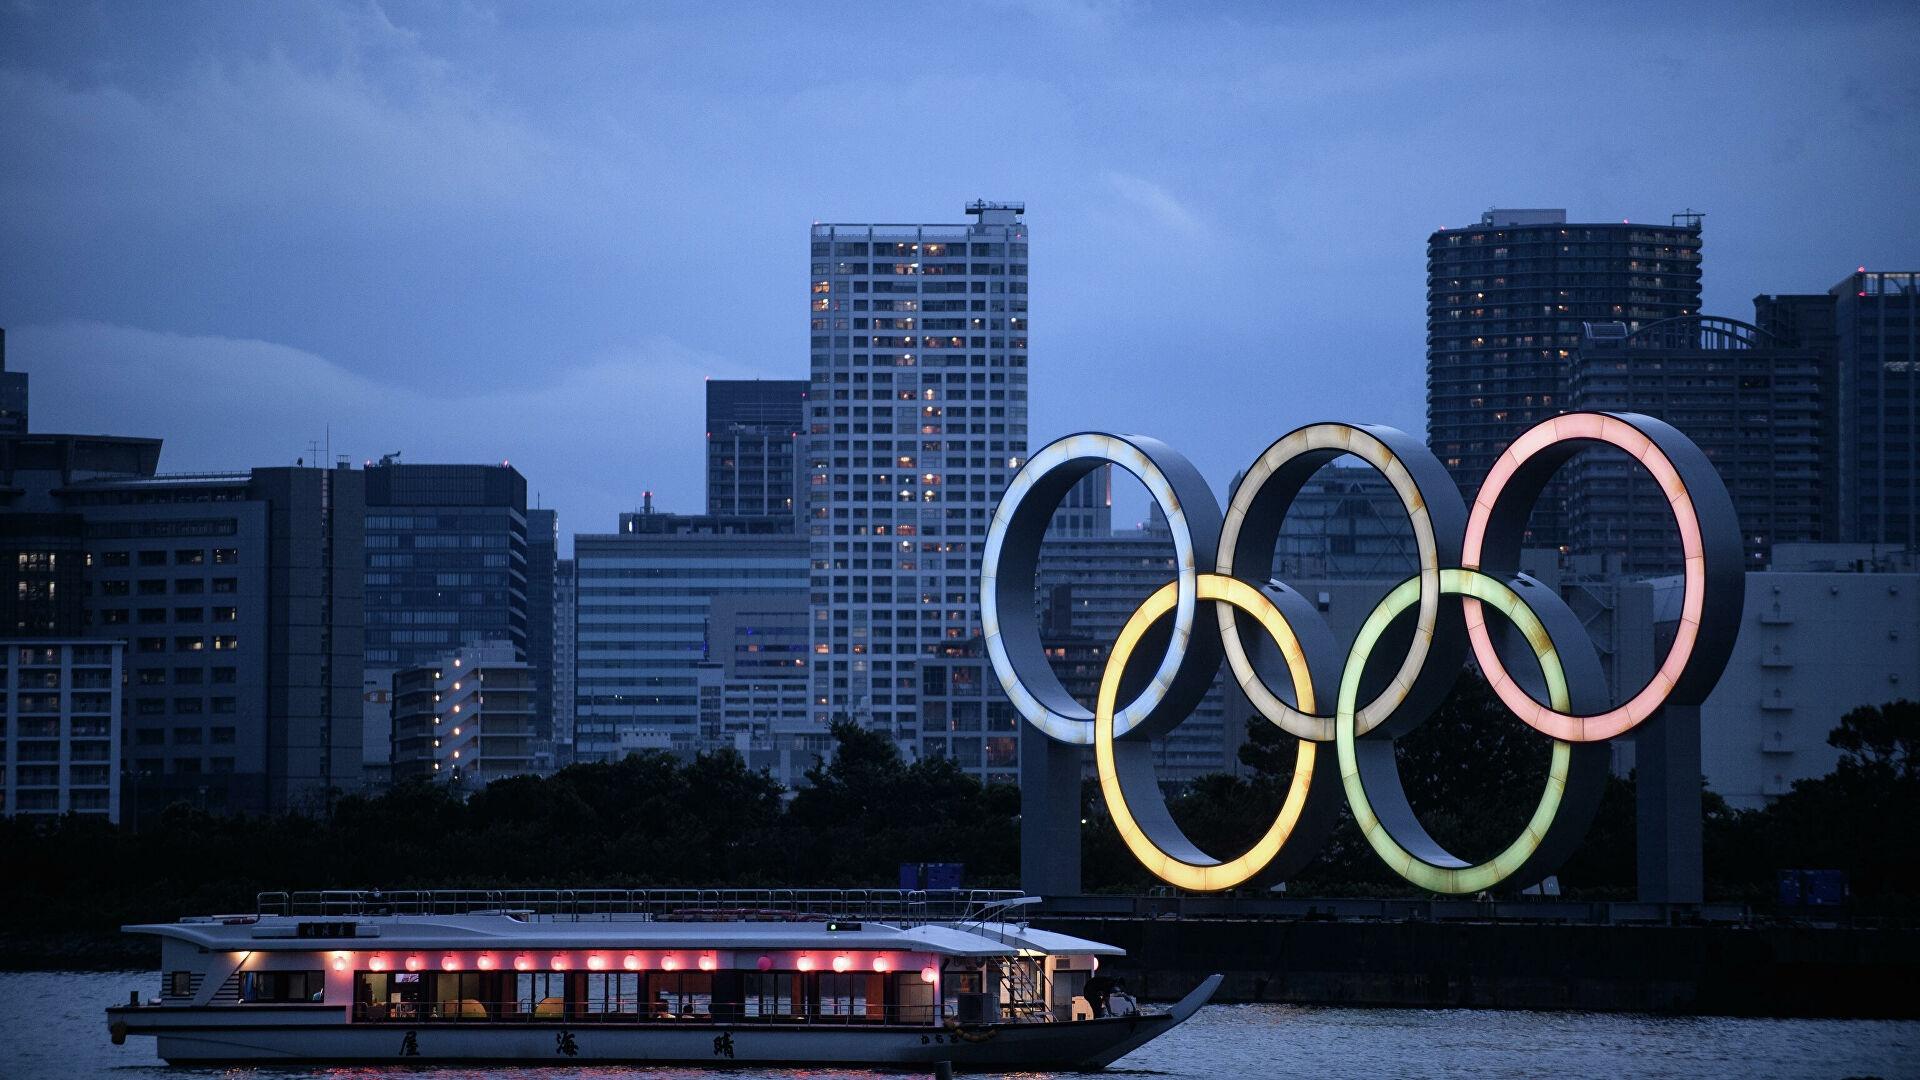 Tokyo 2020 Olympics 1920x1080 wallpaper